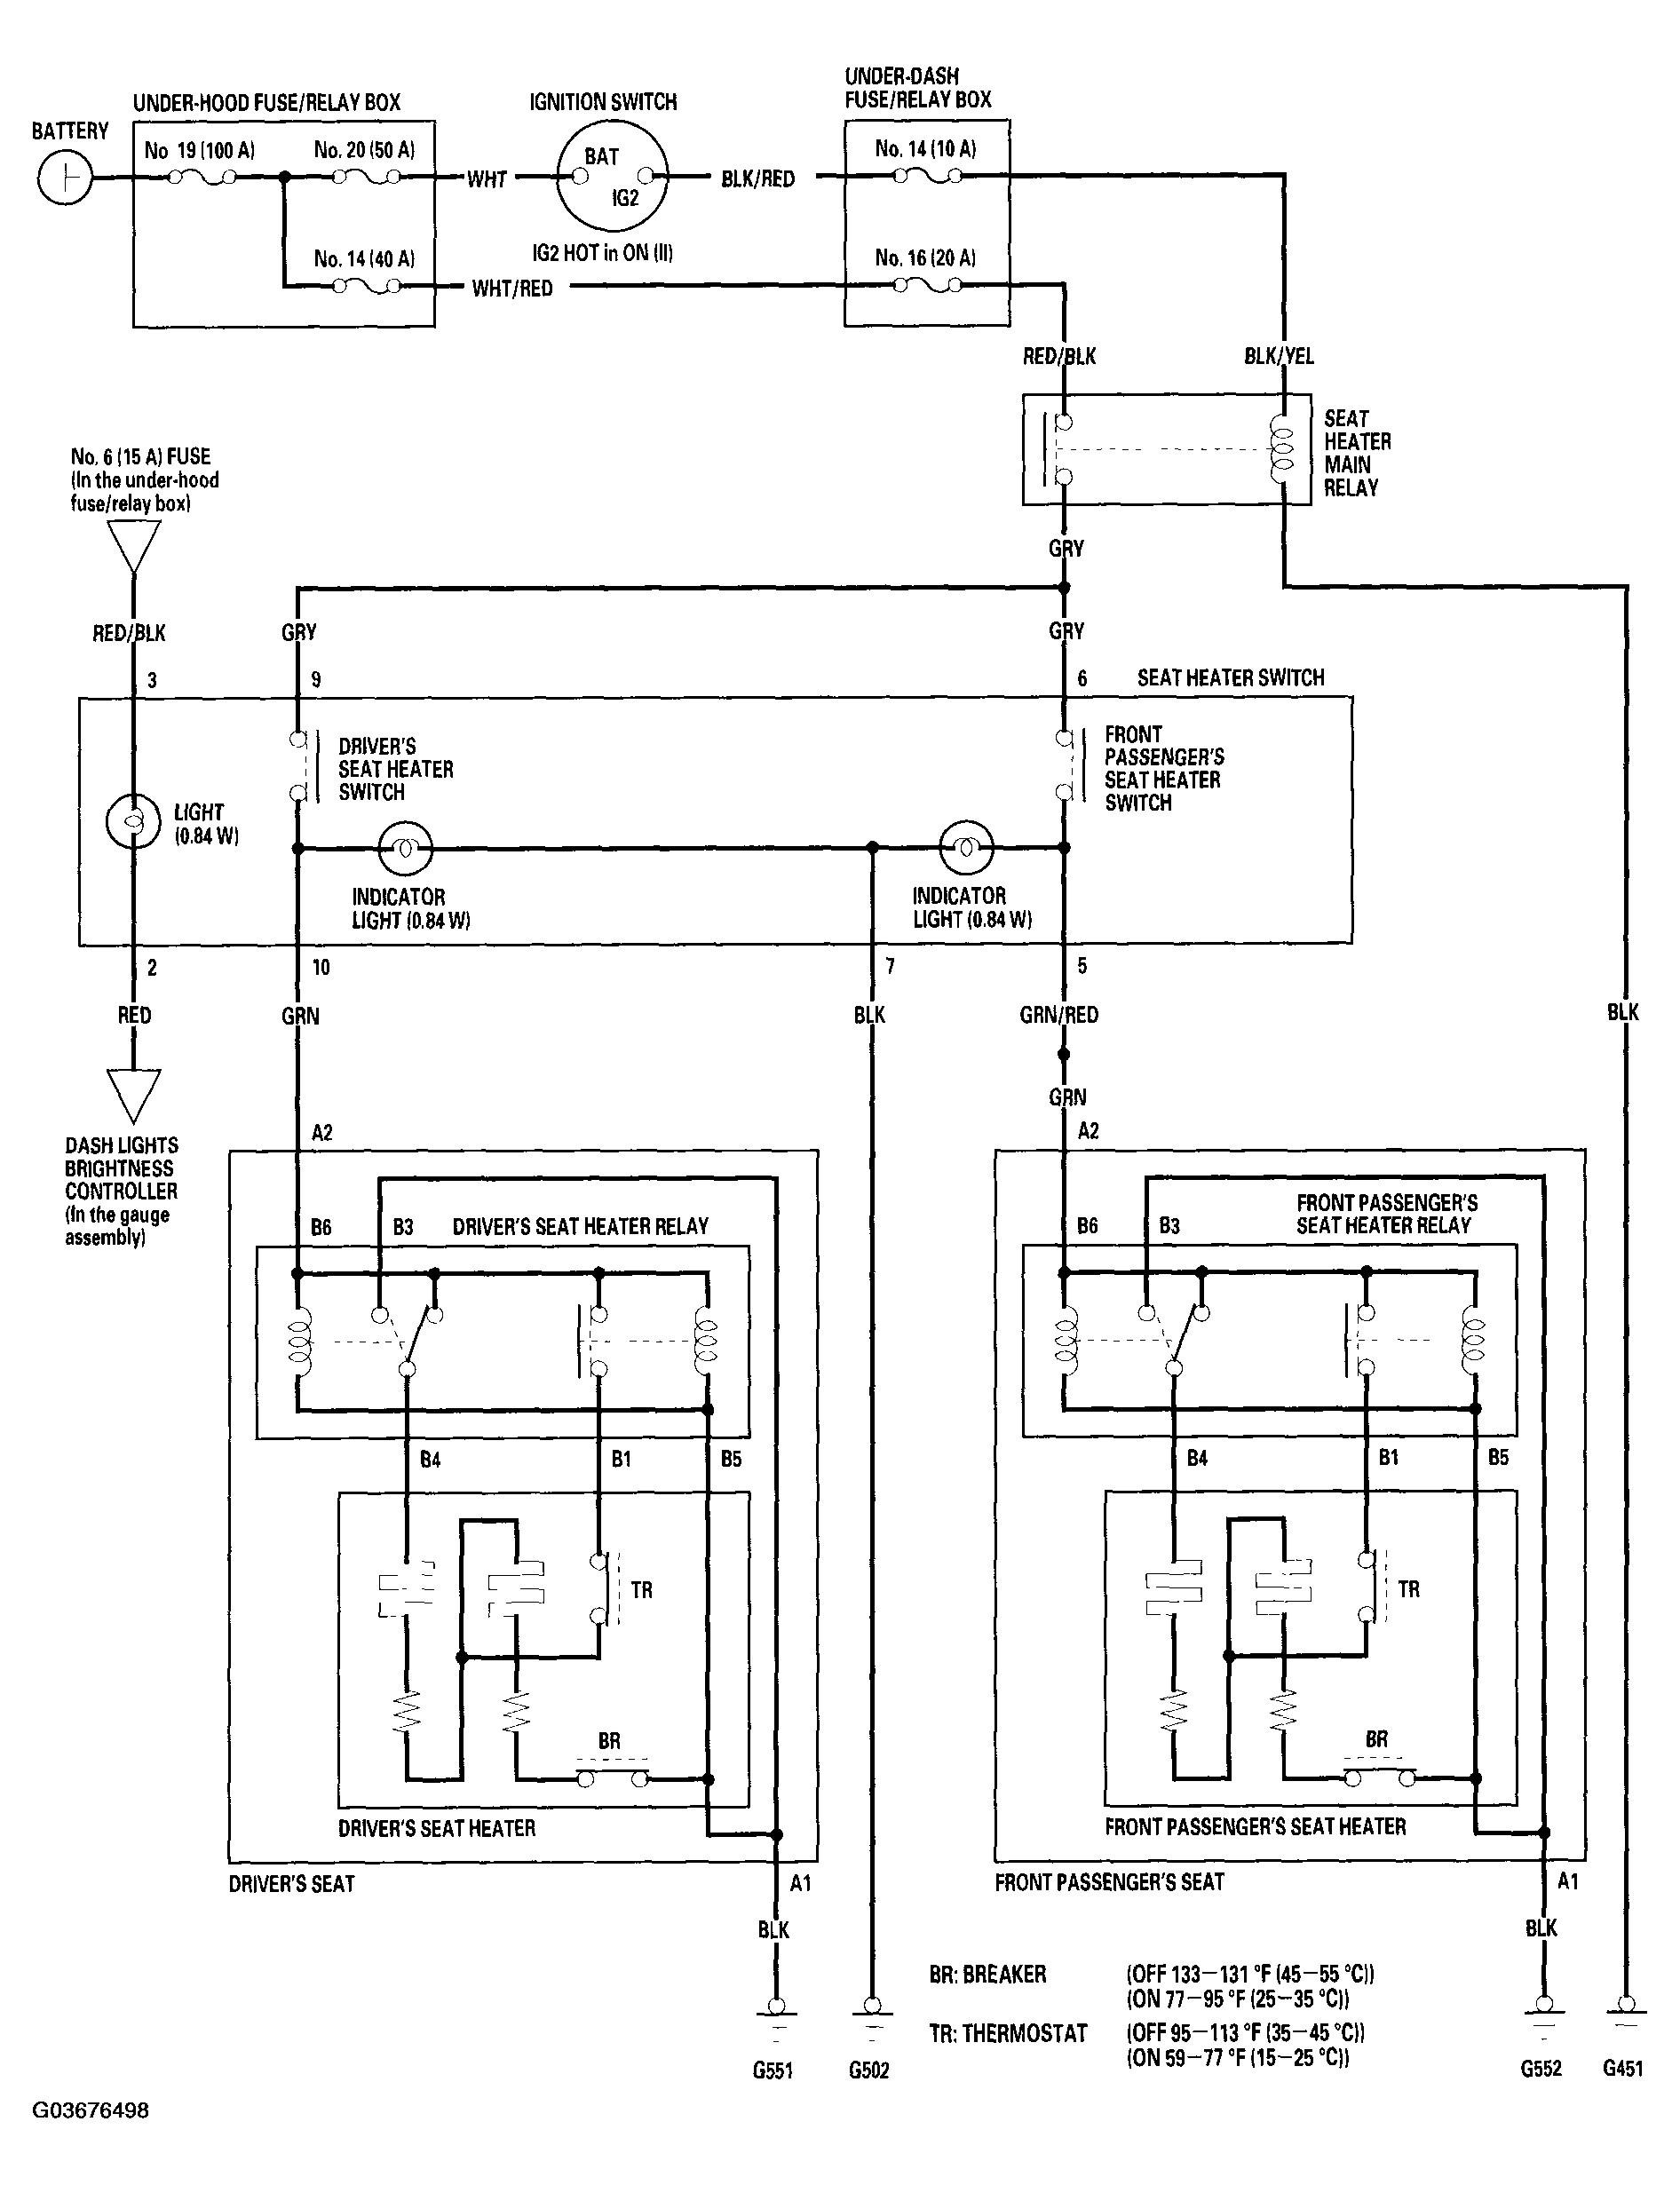 2000 Honda Civic Wiring Diagram 2000 Honda Accord Engine Diagram Cr V Fuse Box Diagram Besides Honda Of 2000 Honda Civic Wiring Diagram